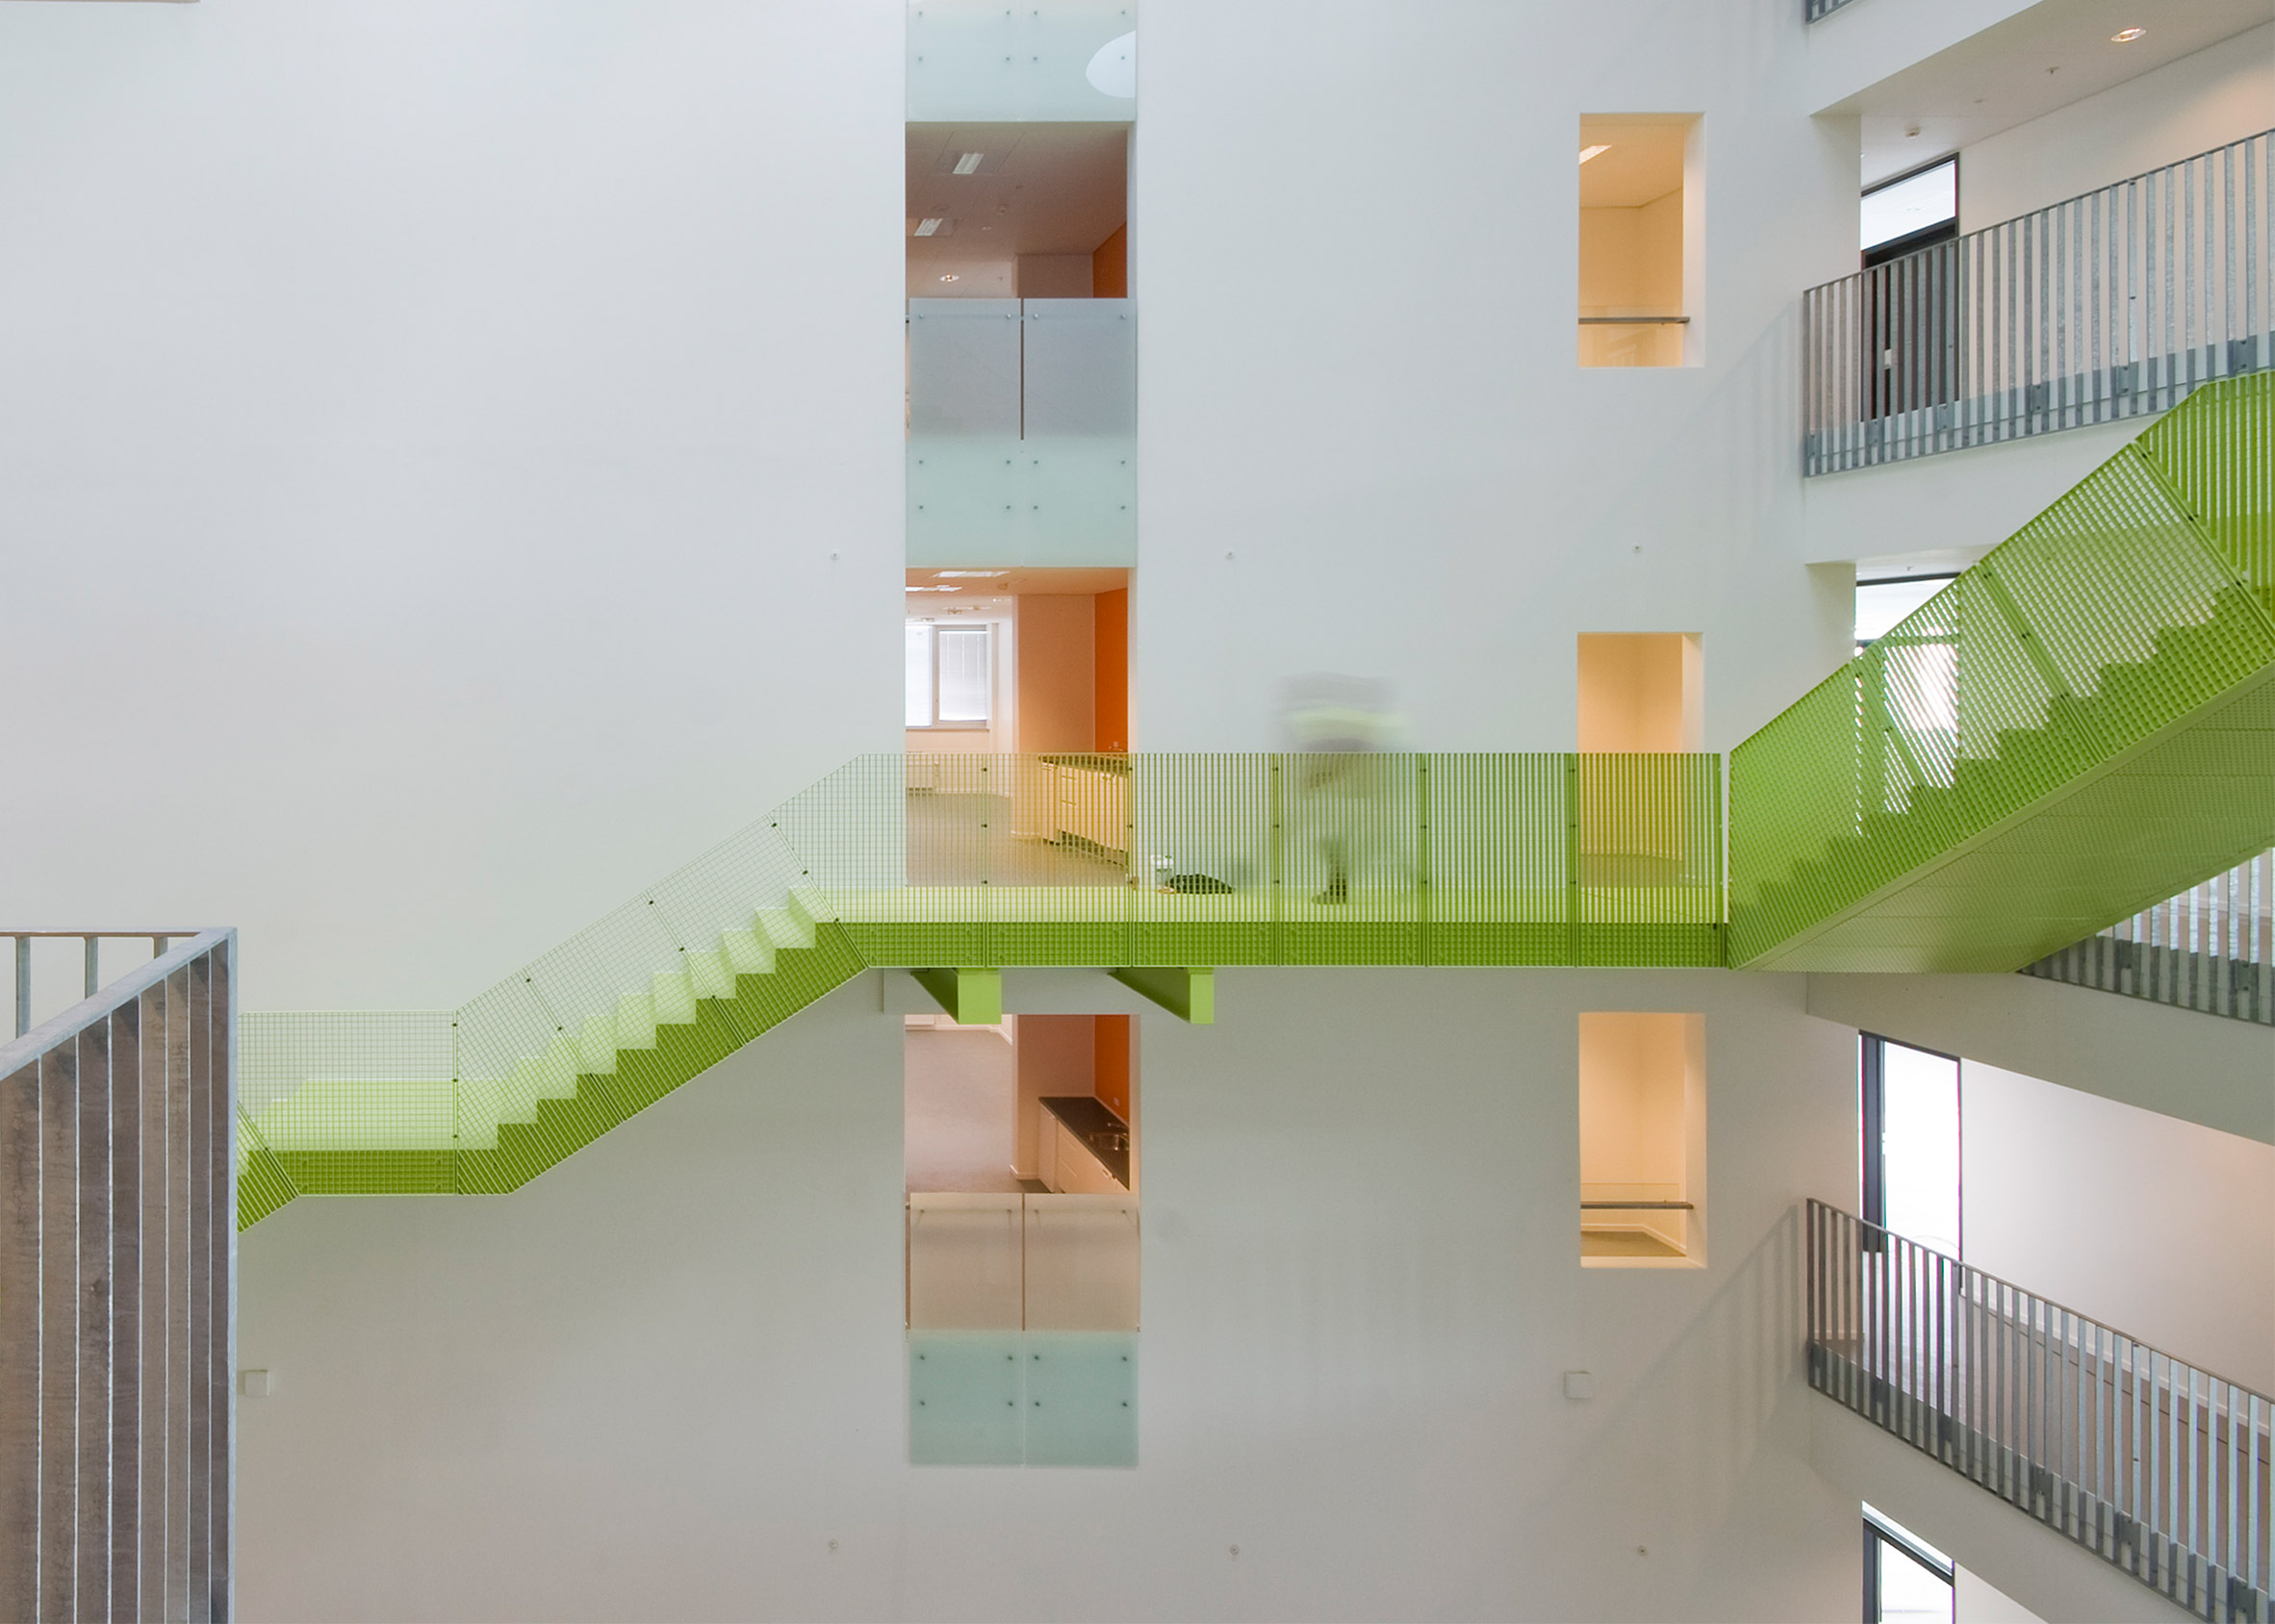 Vitus Bering Innovation Park by C.F. Møller